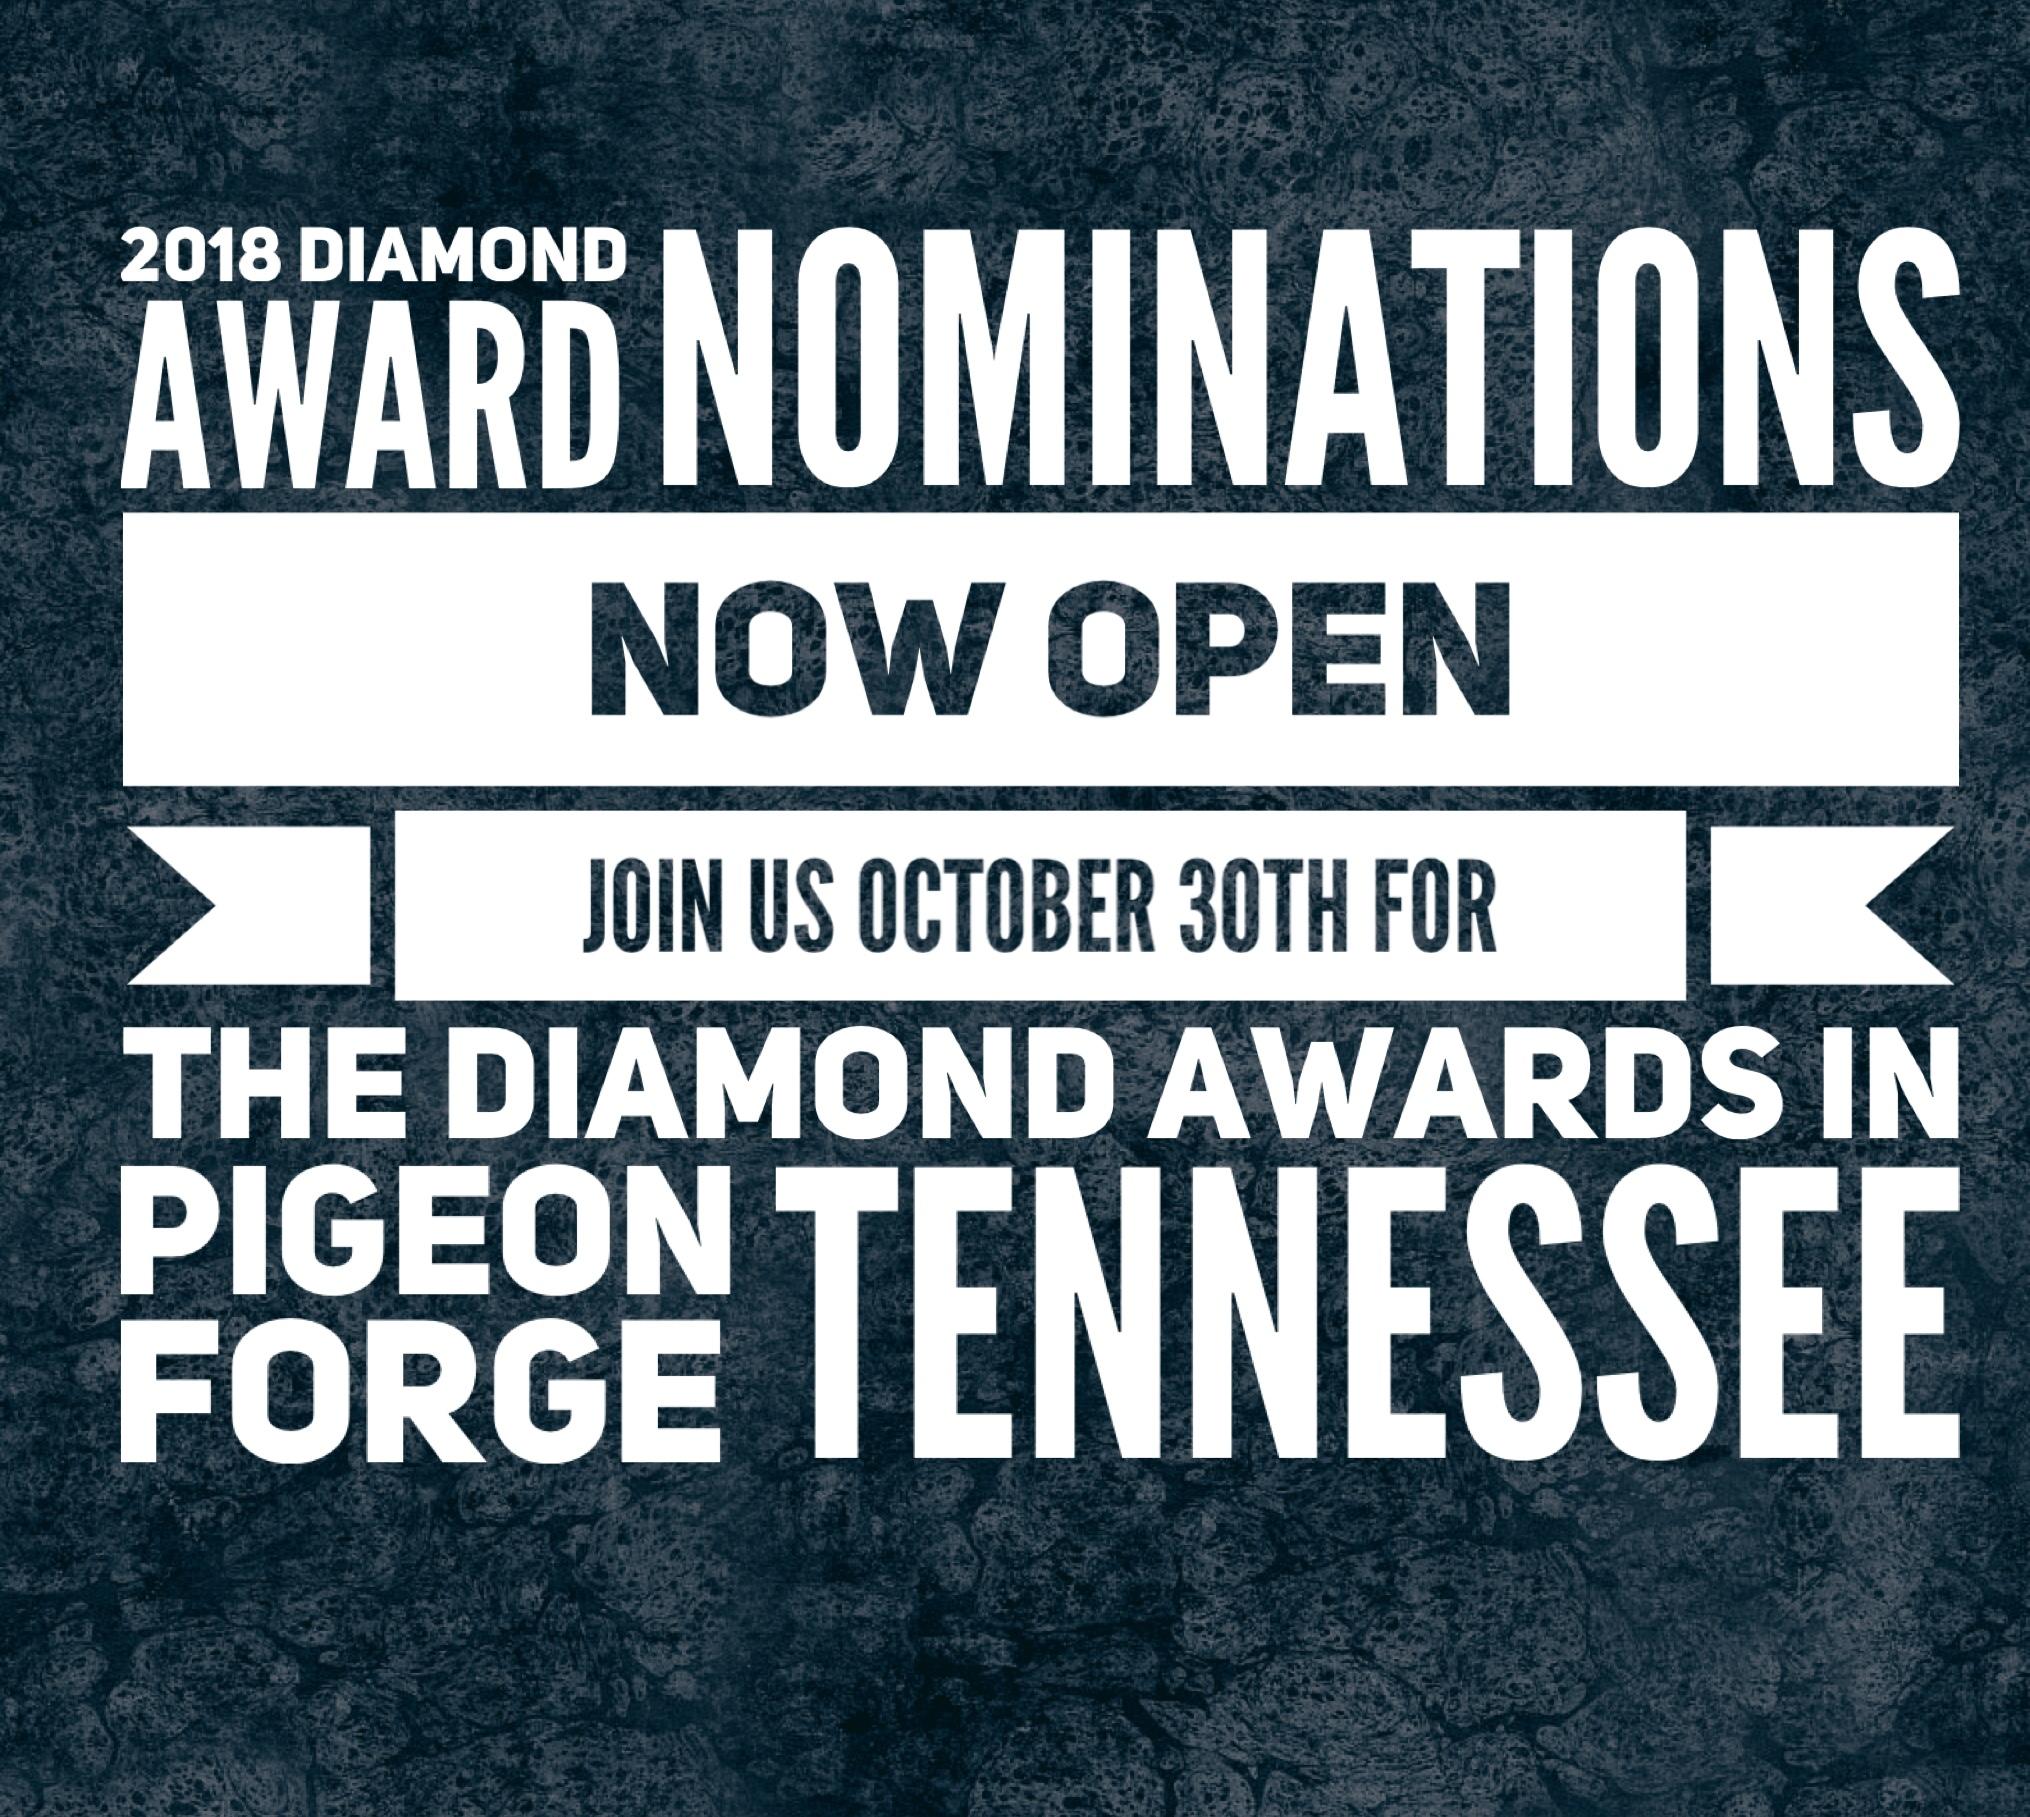 2018 Diamond Award Nominations Now Open